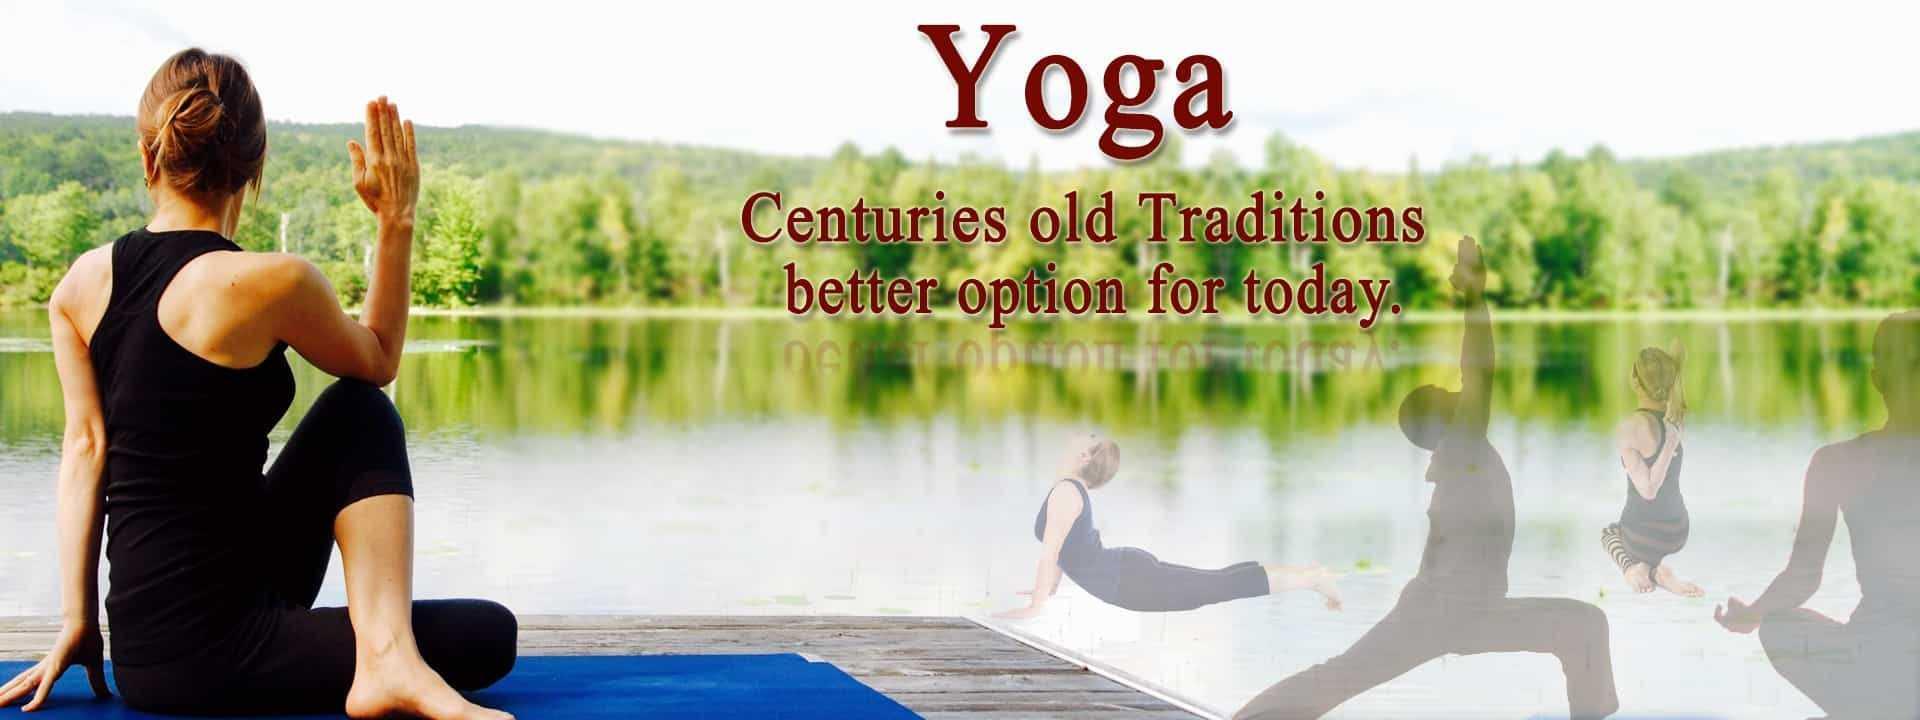 old-yoga